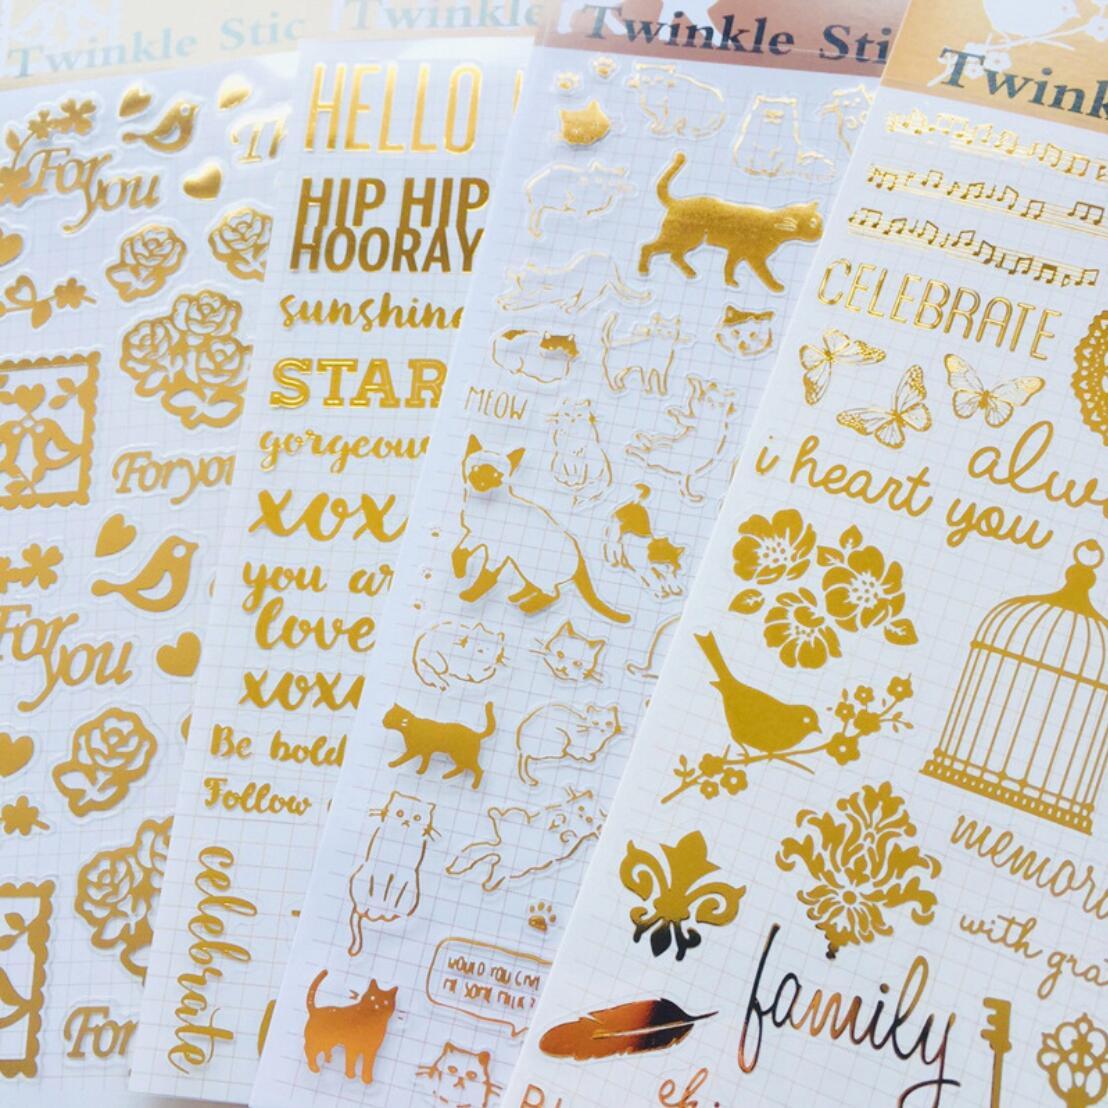 Dorado brillo diario decorativa Washi pegatinas Scrapbooking palo etiqueta diario papelería álbum pegatinas